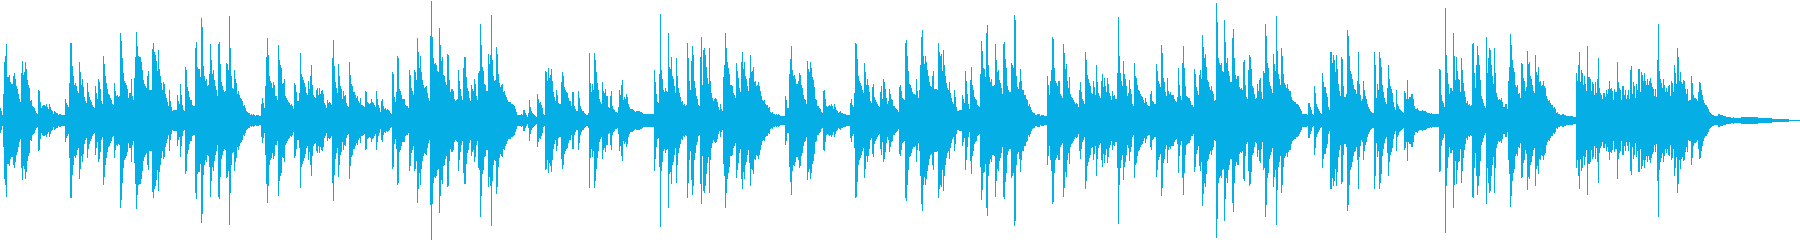 ハープ ハープ ハープ ハープ 無限光の再生済みの波形